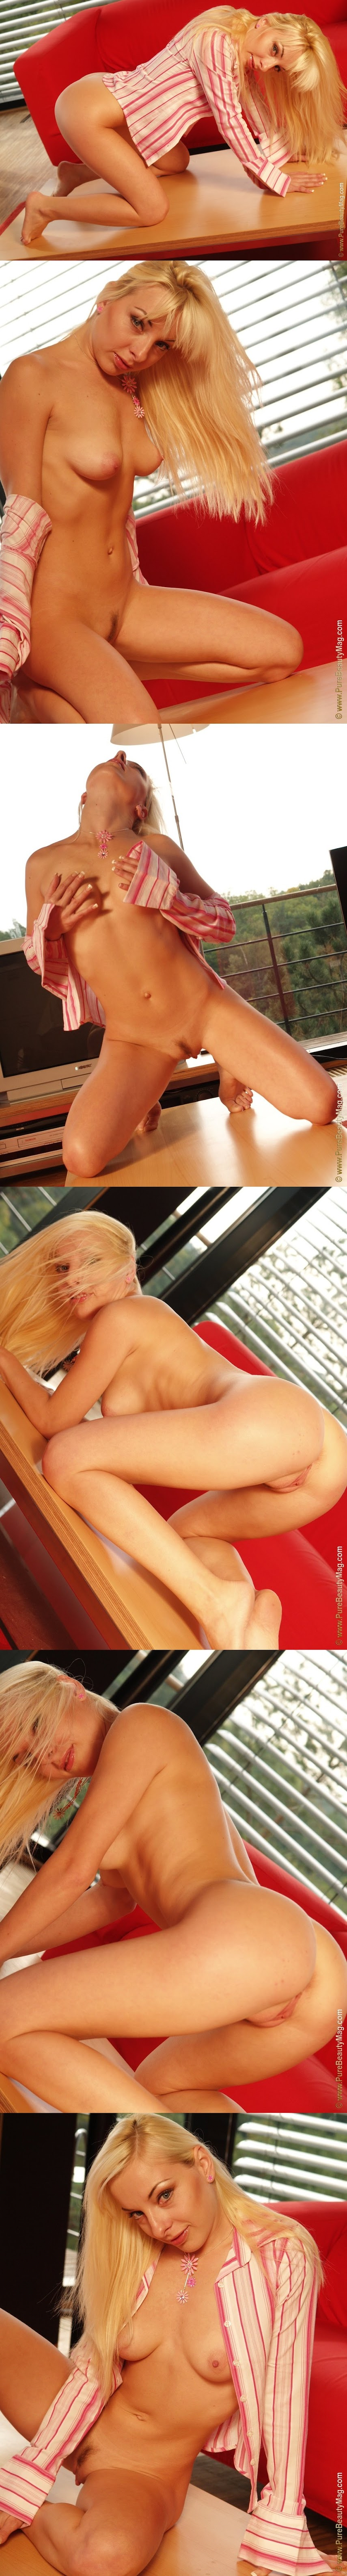 PureBeautyMag PBM  - 2005-11-06 -  s142187 - Sjuzi Angel - Sugar Coated - 2560px sexy girls image jav